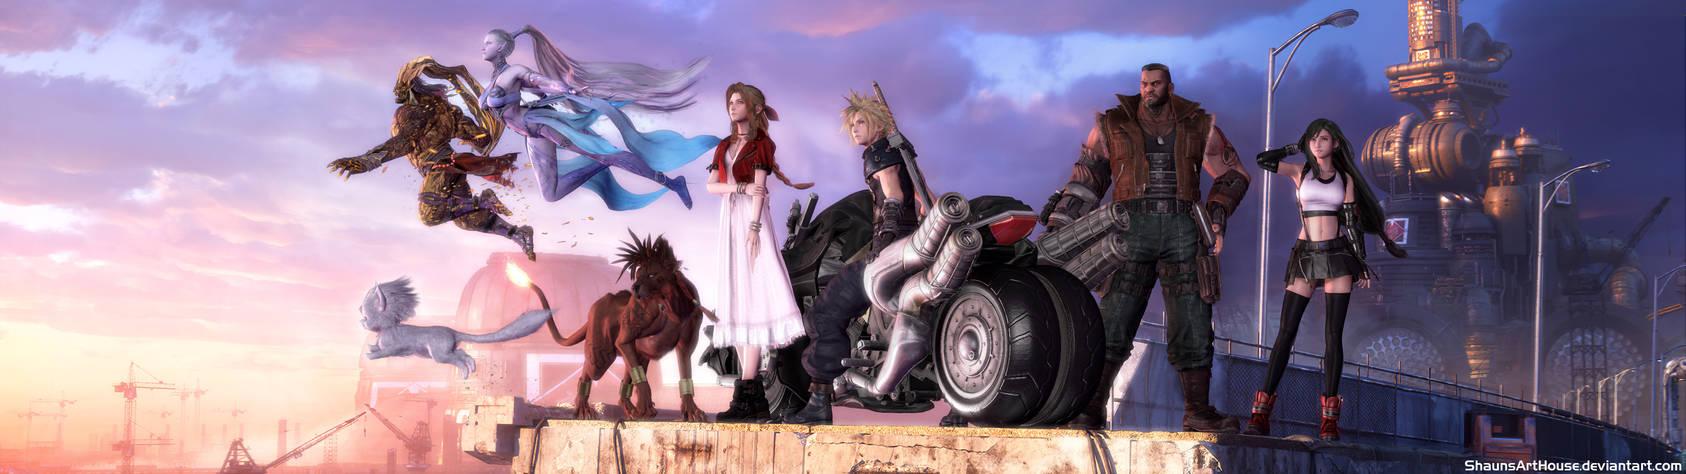 Final Fantasy 7 Remake Dual Screen Wallpaper